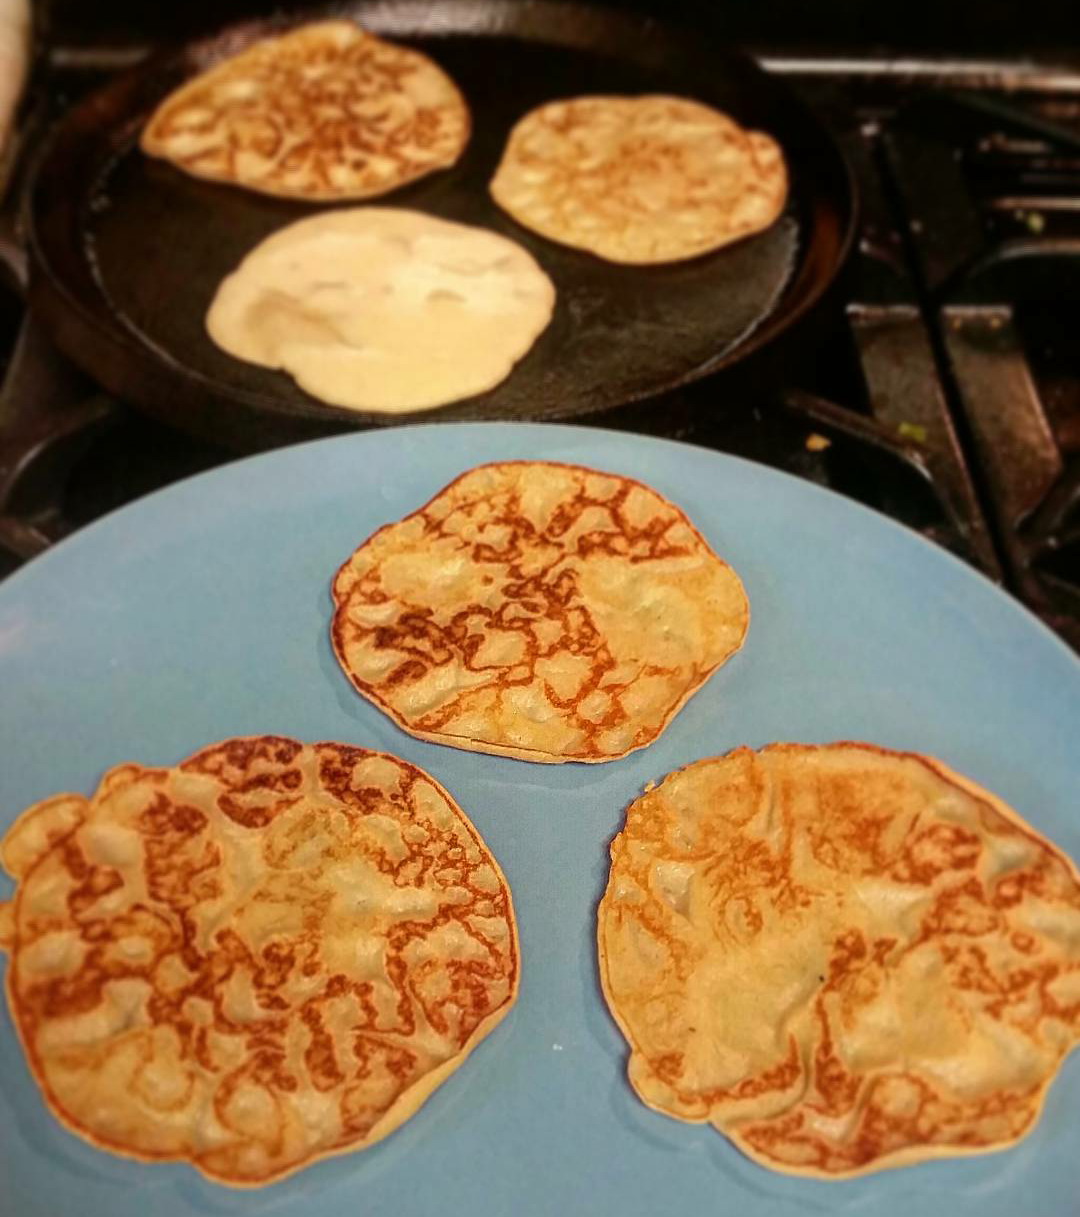 Cassava Flour Azorean-style Pancakes (Paleo, Nut-free) 2.png